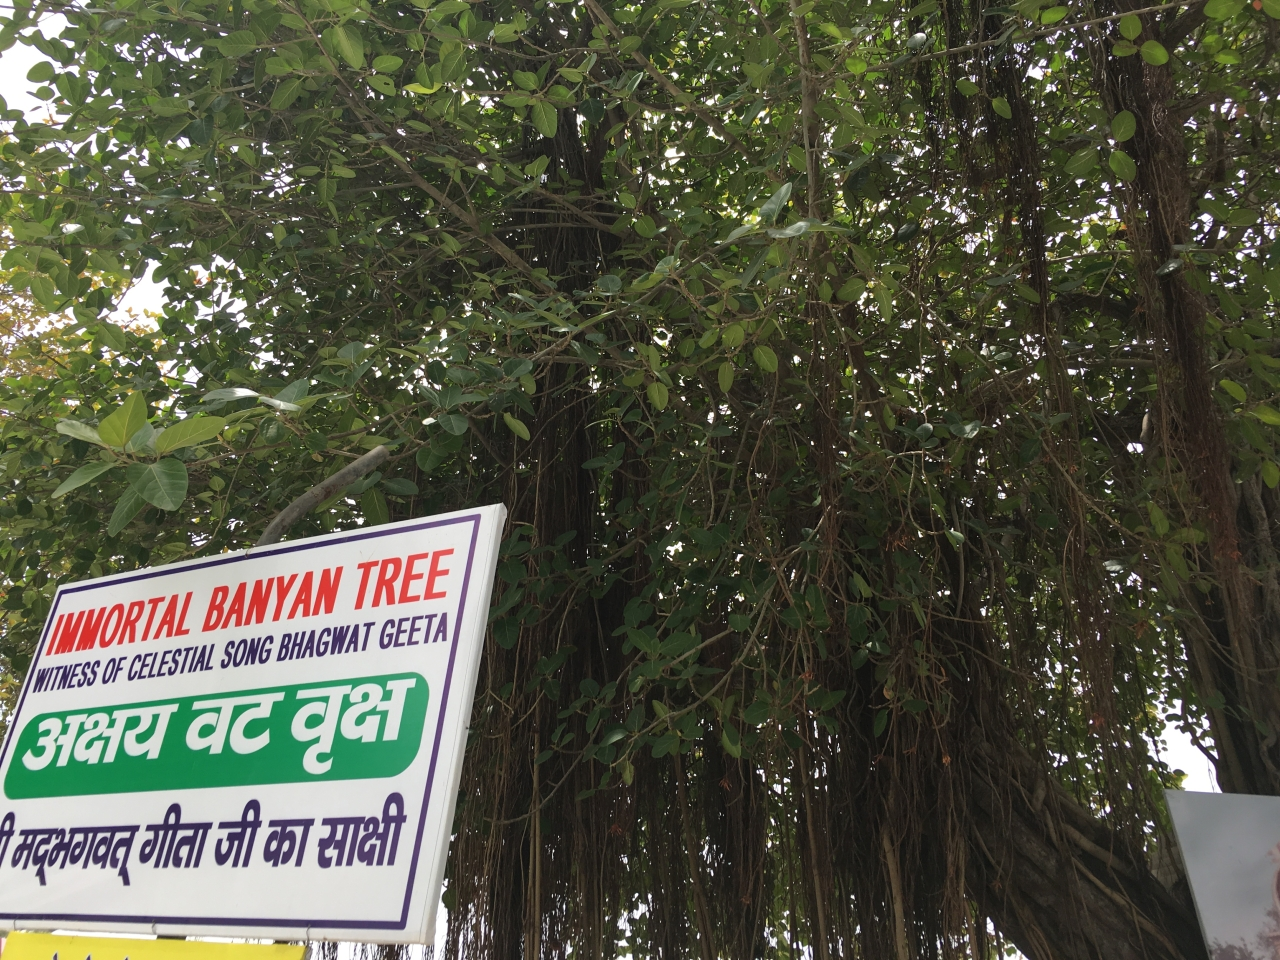 The sacred tree at Jyotisar.